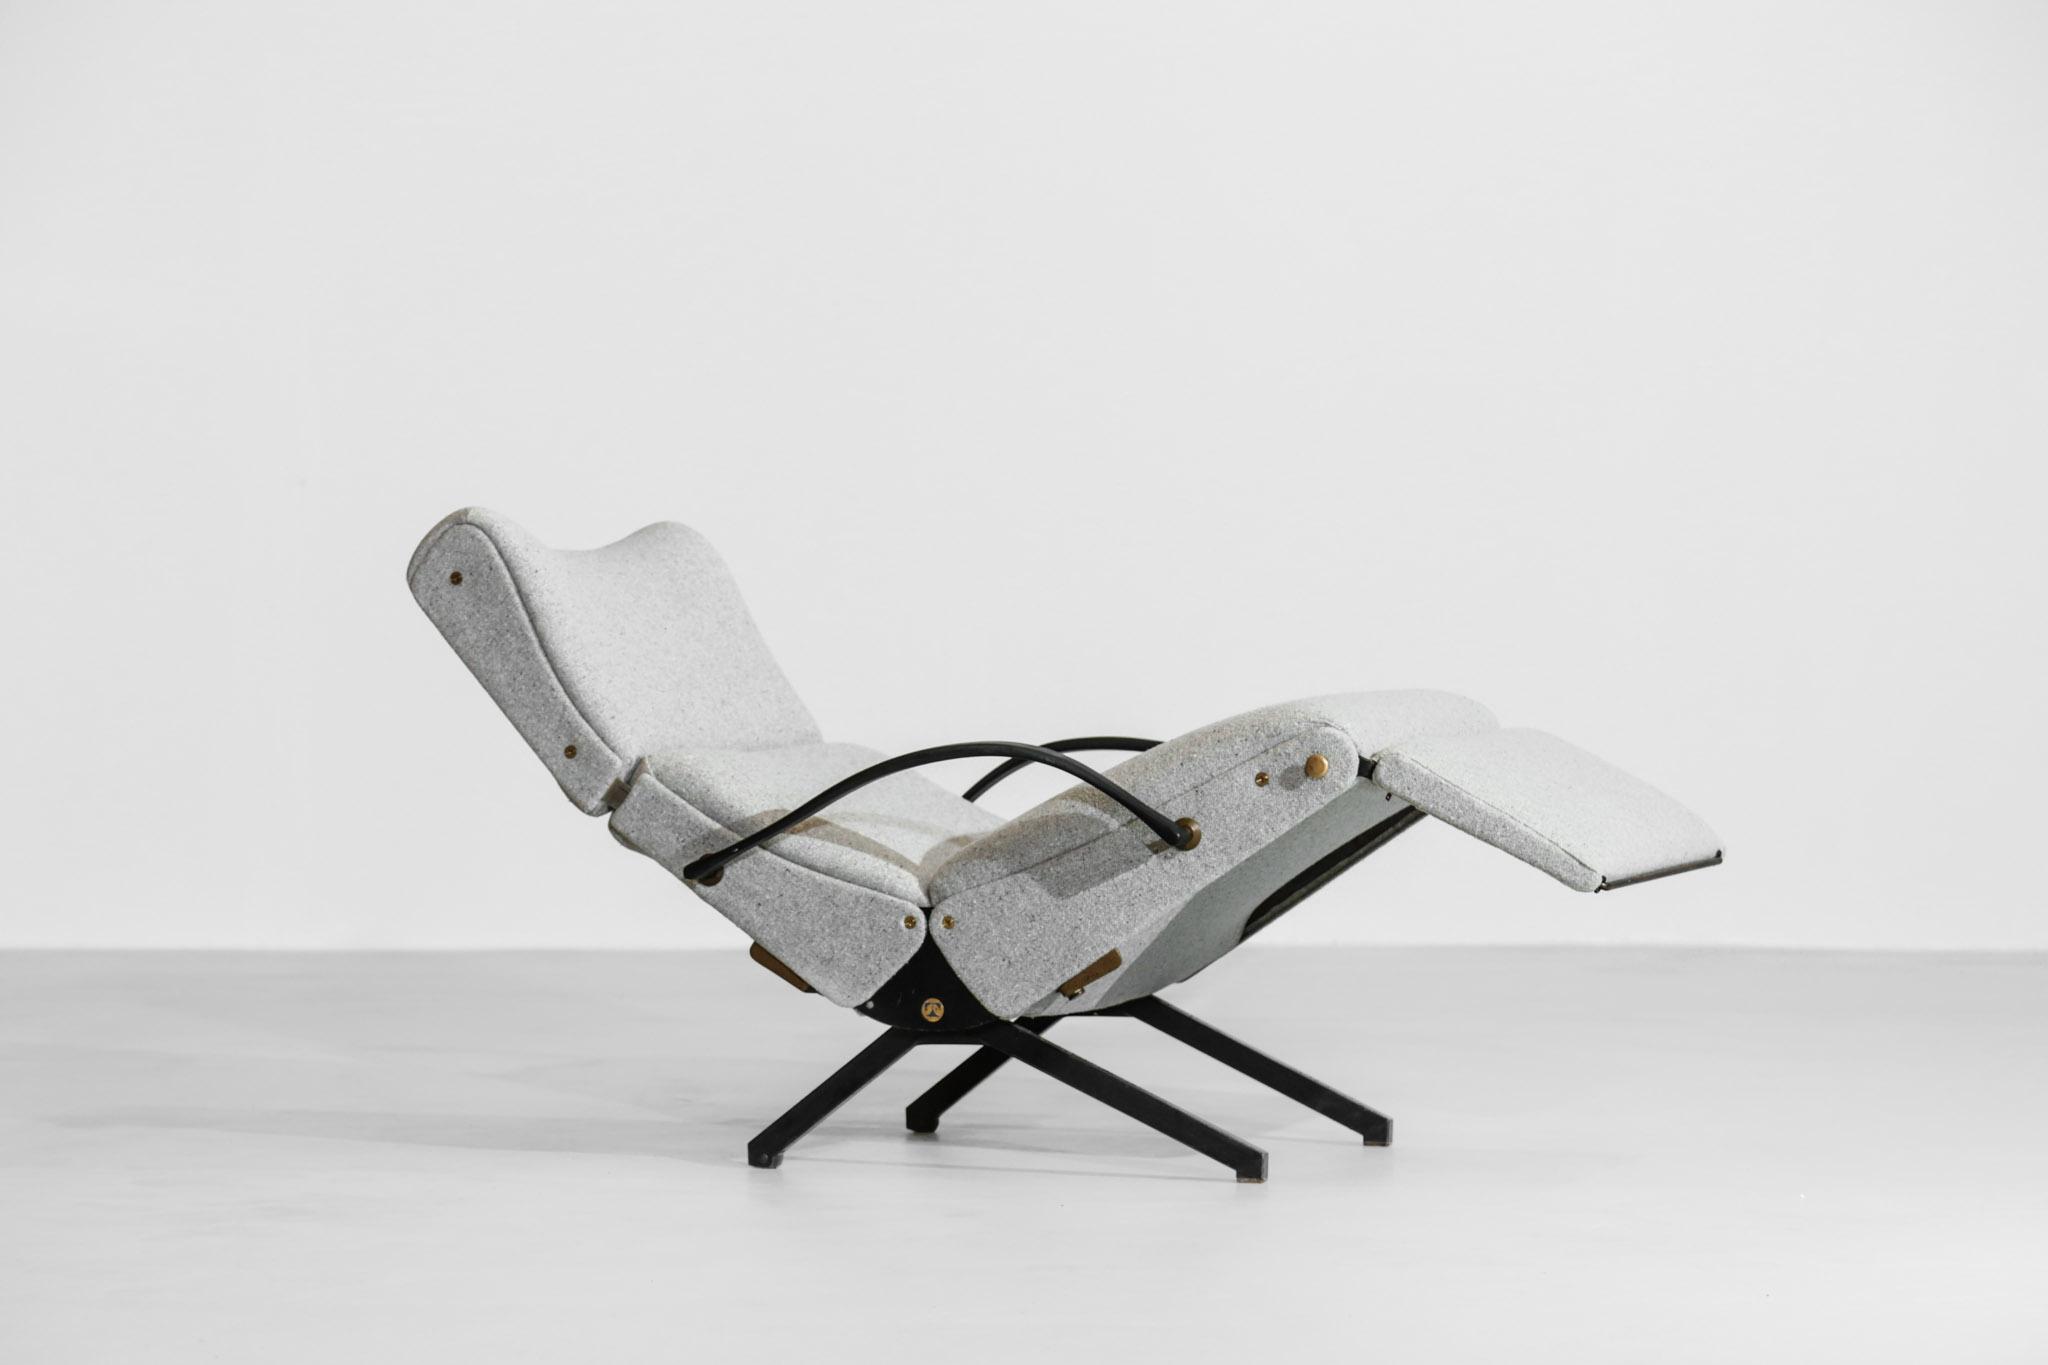 Fauteuil P40 Par Osvaldo Borsani Pour Tecno Design Italien Danke